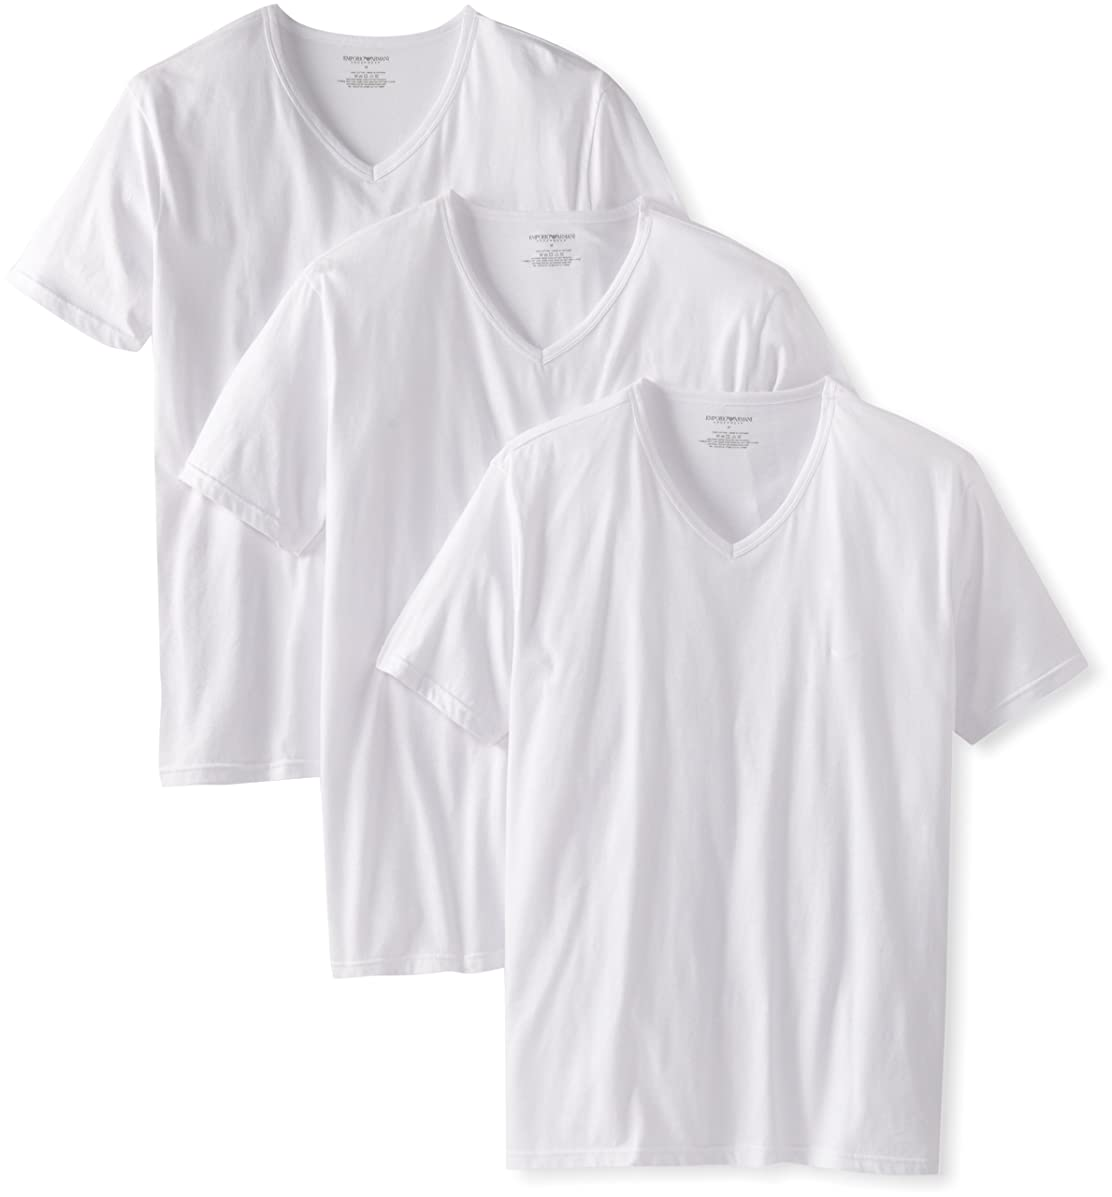 Emporio Armani Men's 3-Pack Regular Fit V-Neck Undershirt